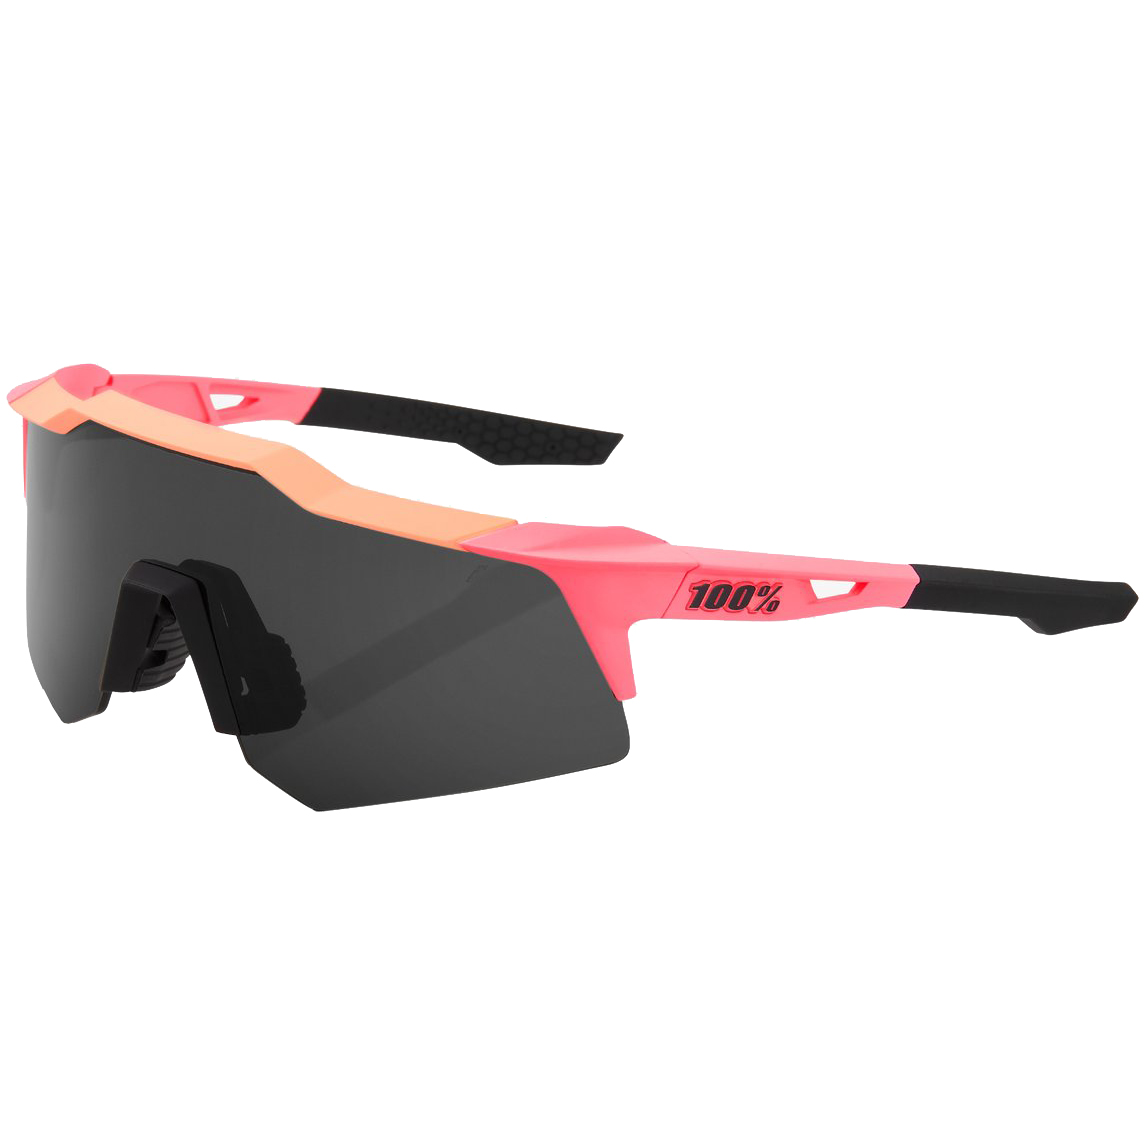 Imagen de 100% Speedcraft - XS - Gafas - Matte Washed Out Neon Pink/Smoke Lens + Clear